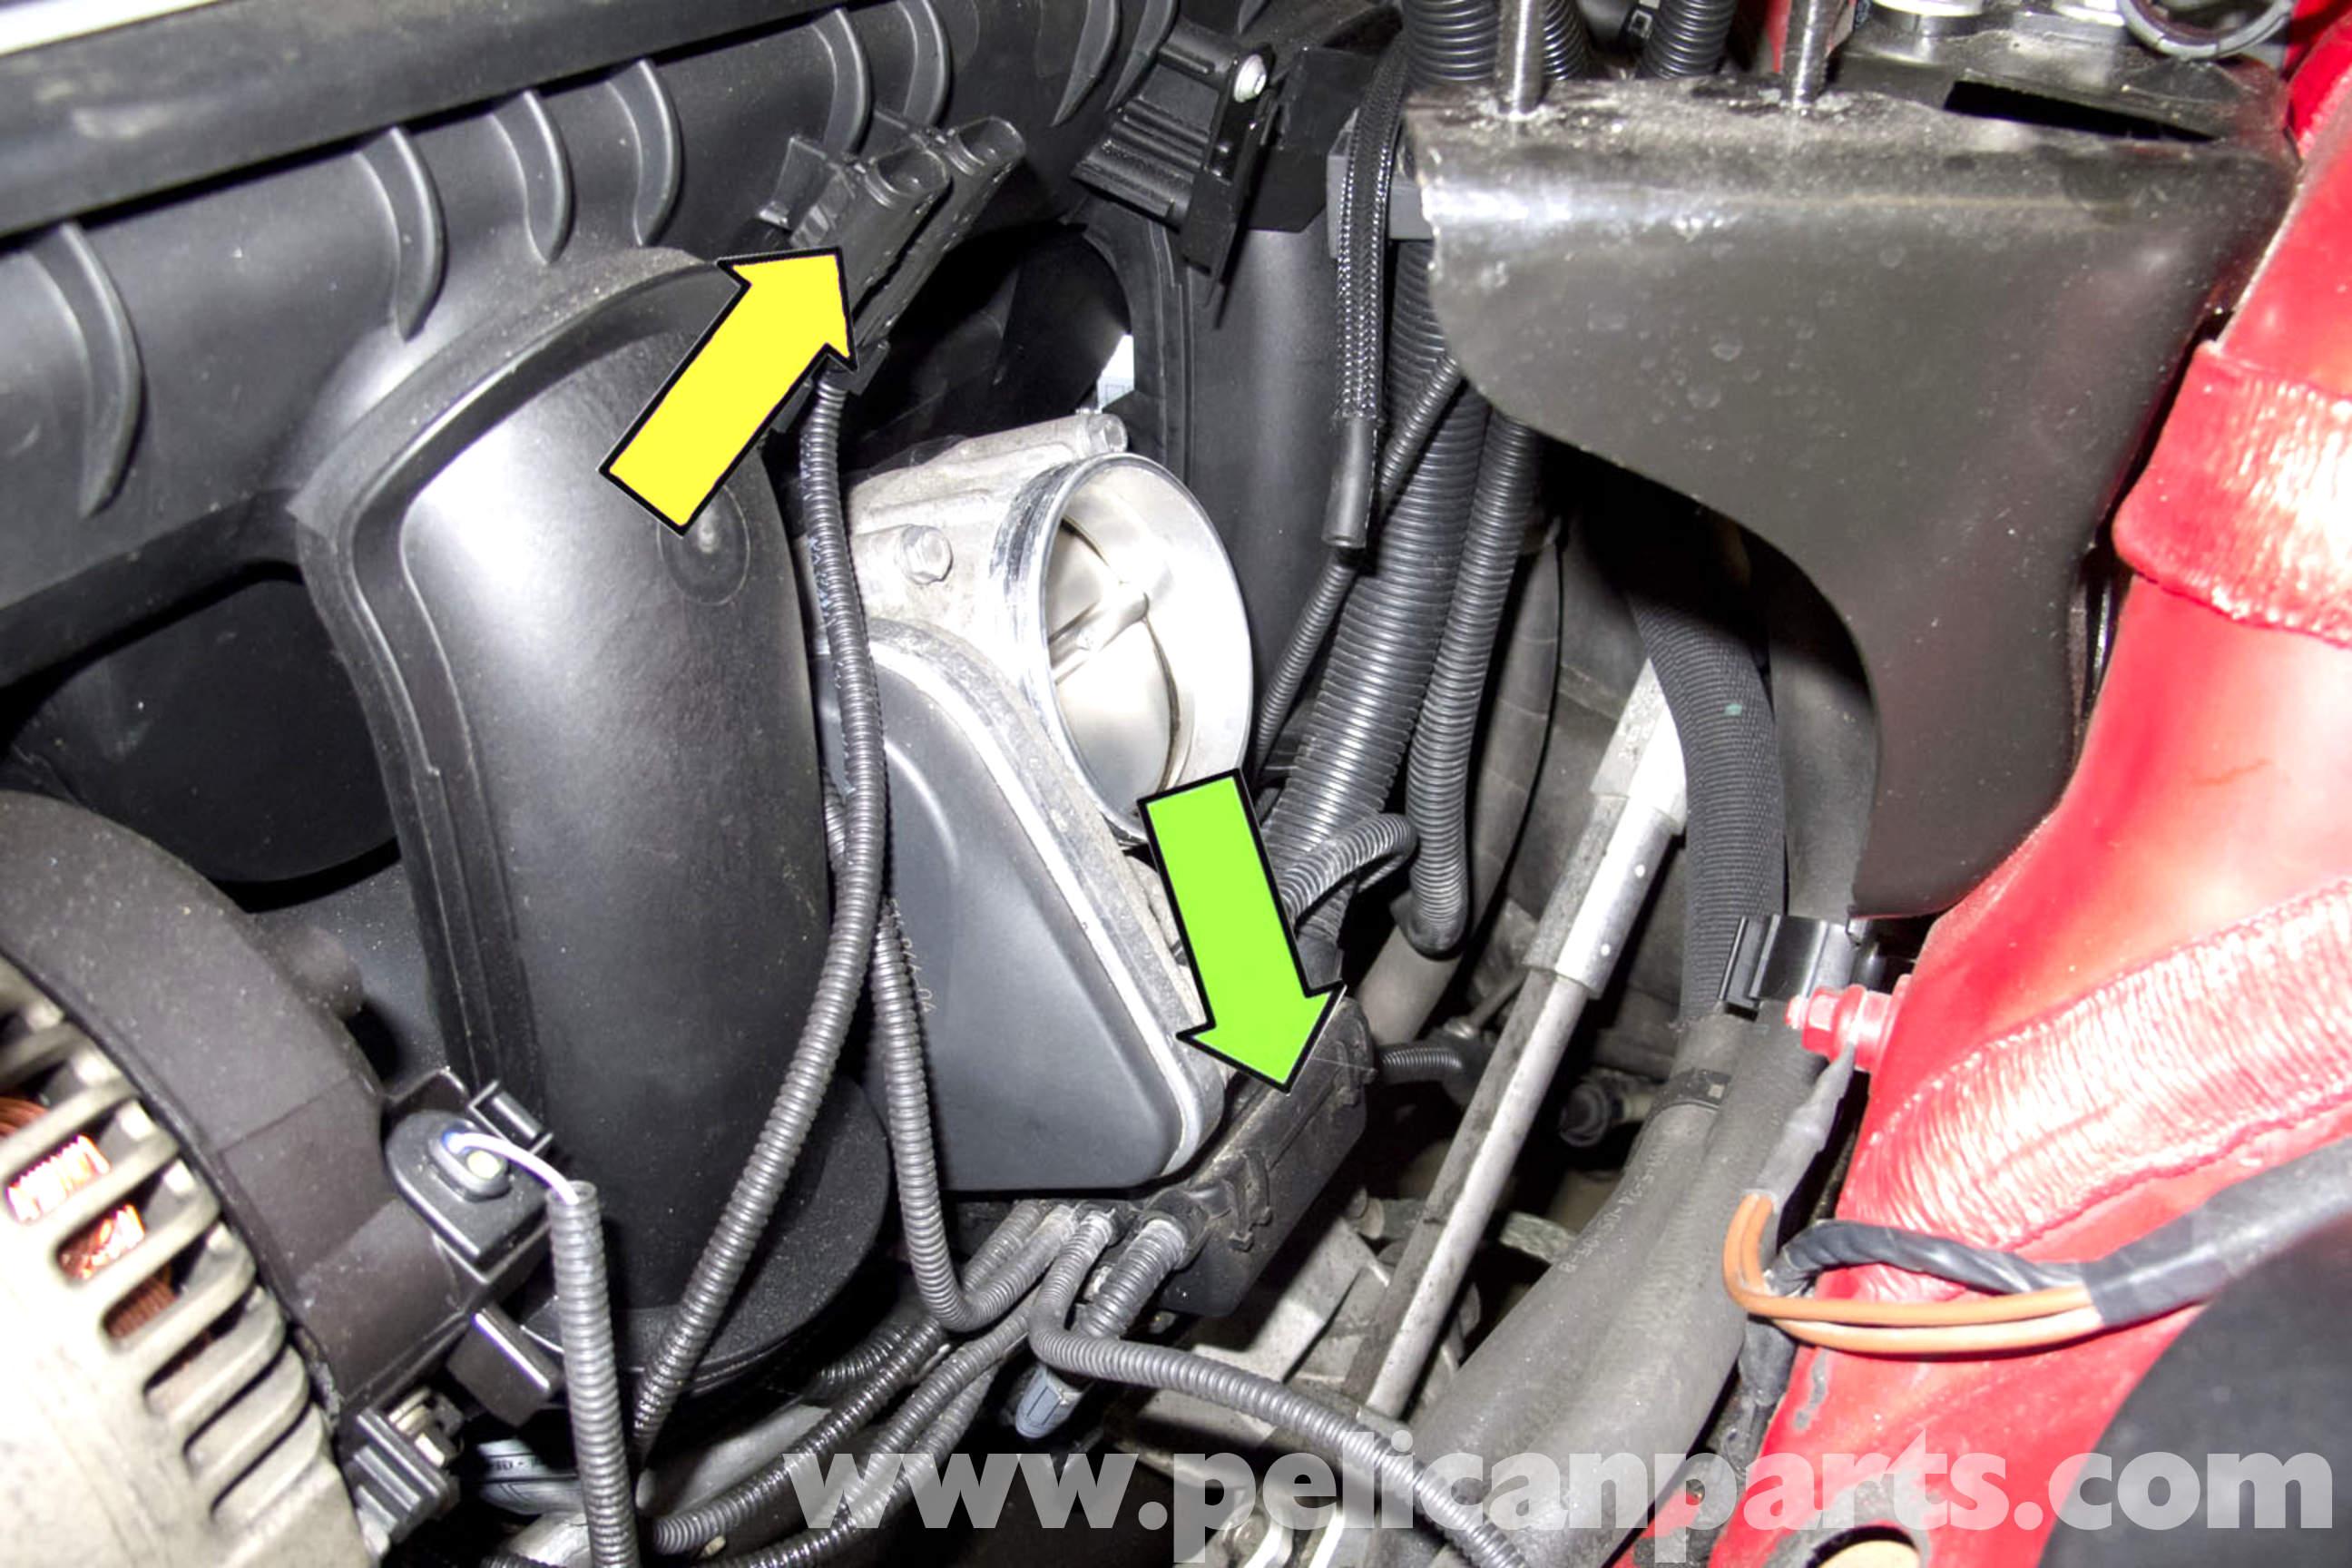 Emission Wiring Diagram 2001 Jeep Cherokee Bmw E90 Intake Manifold Replacement E91 E92 E93